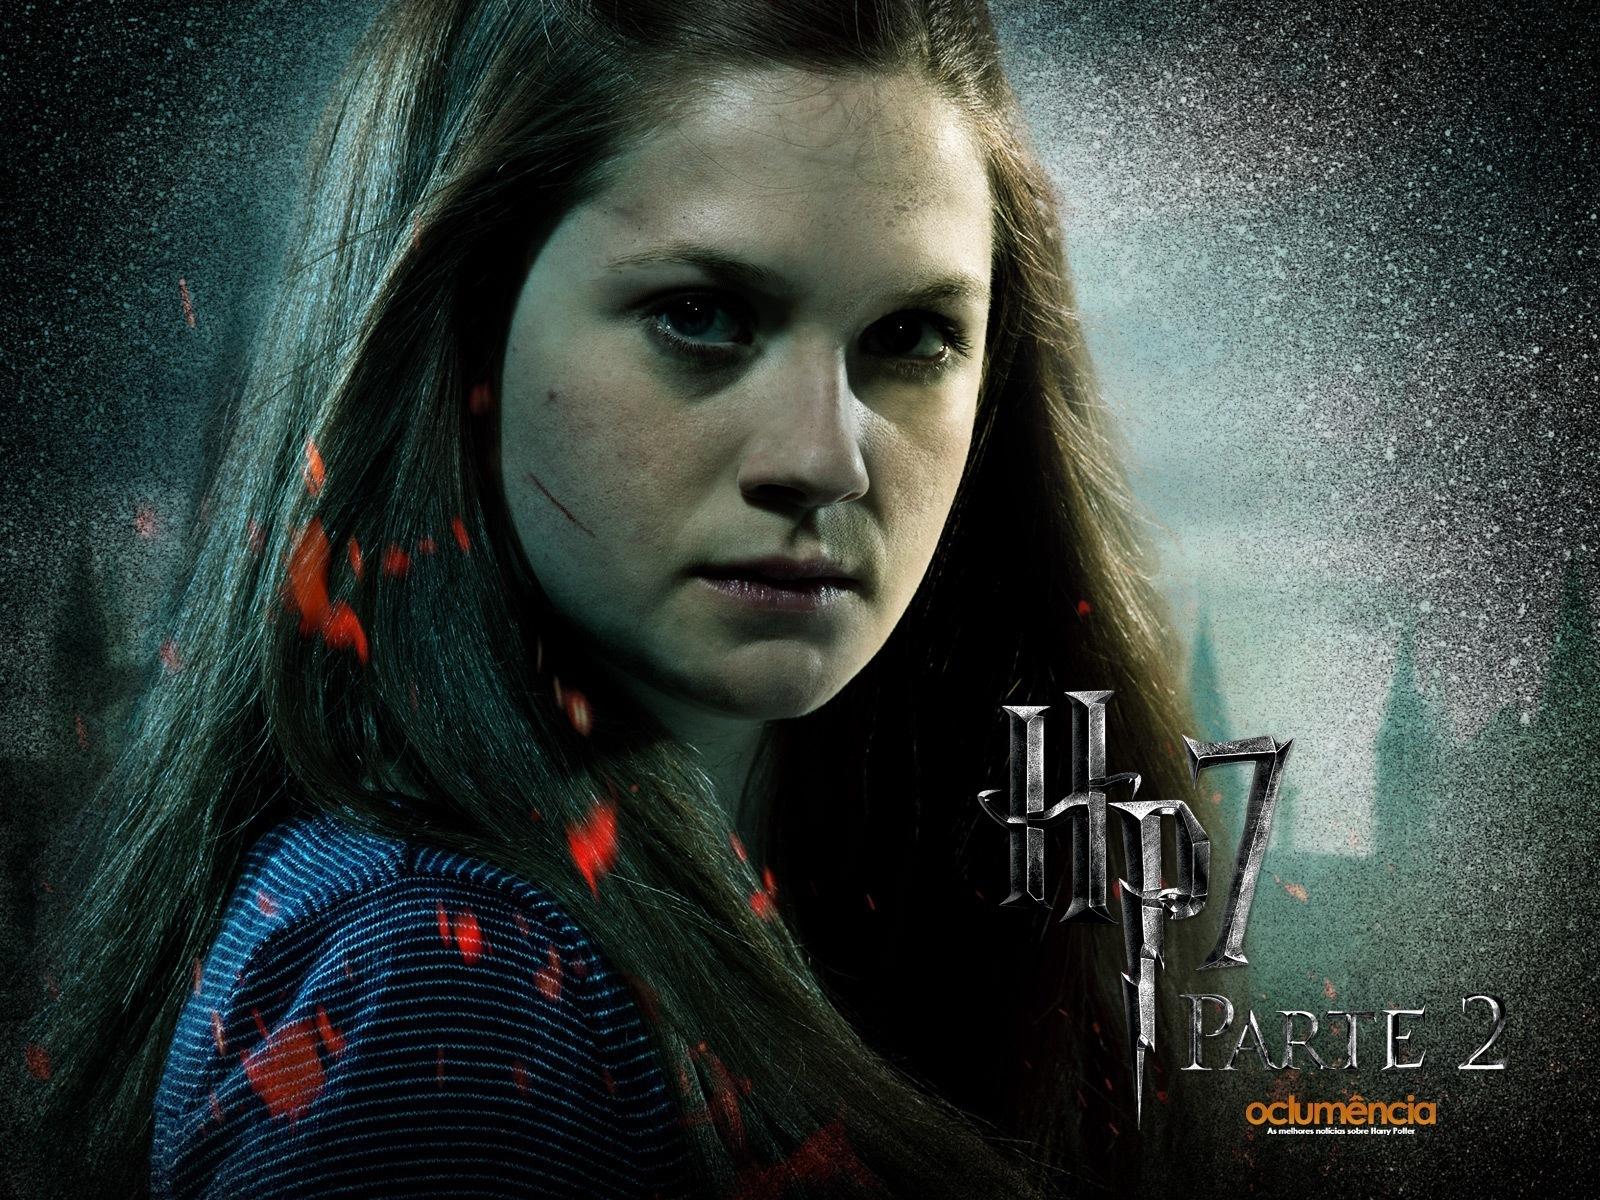 Harry potter - 17 Best Images About Harry Potter On Pinterest File And Http Www Jennisonbeautysupply Com